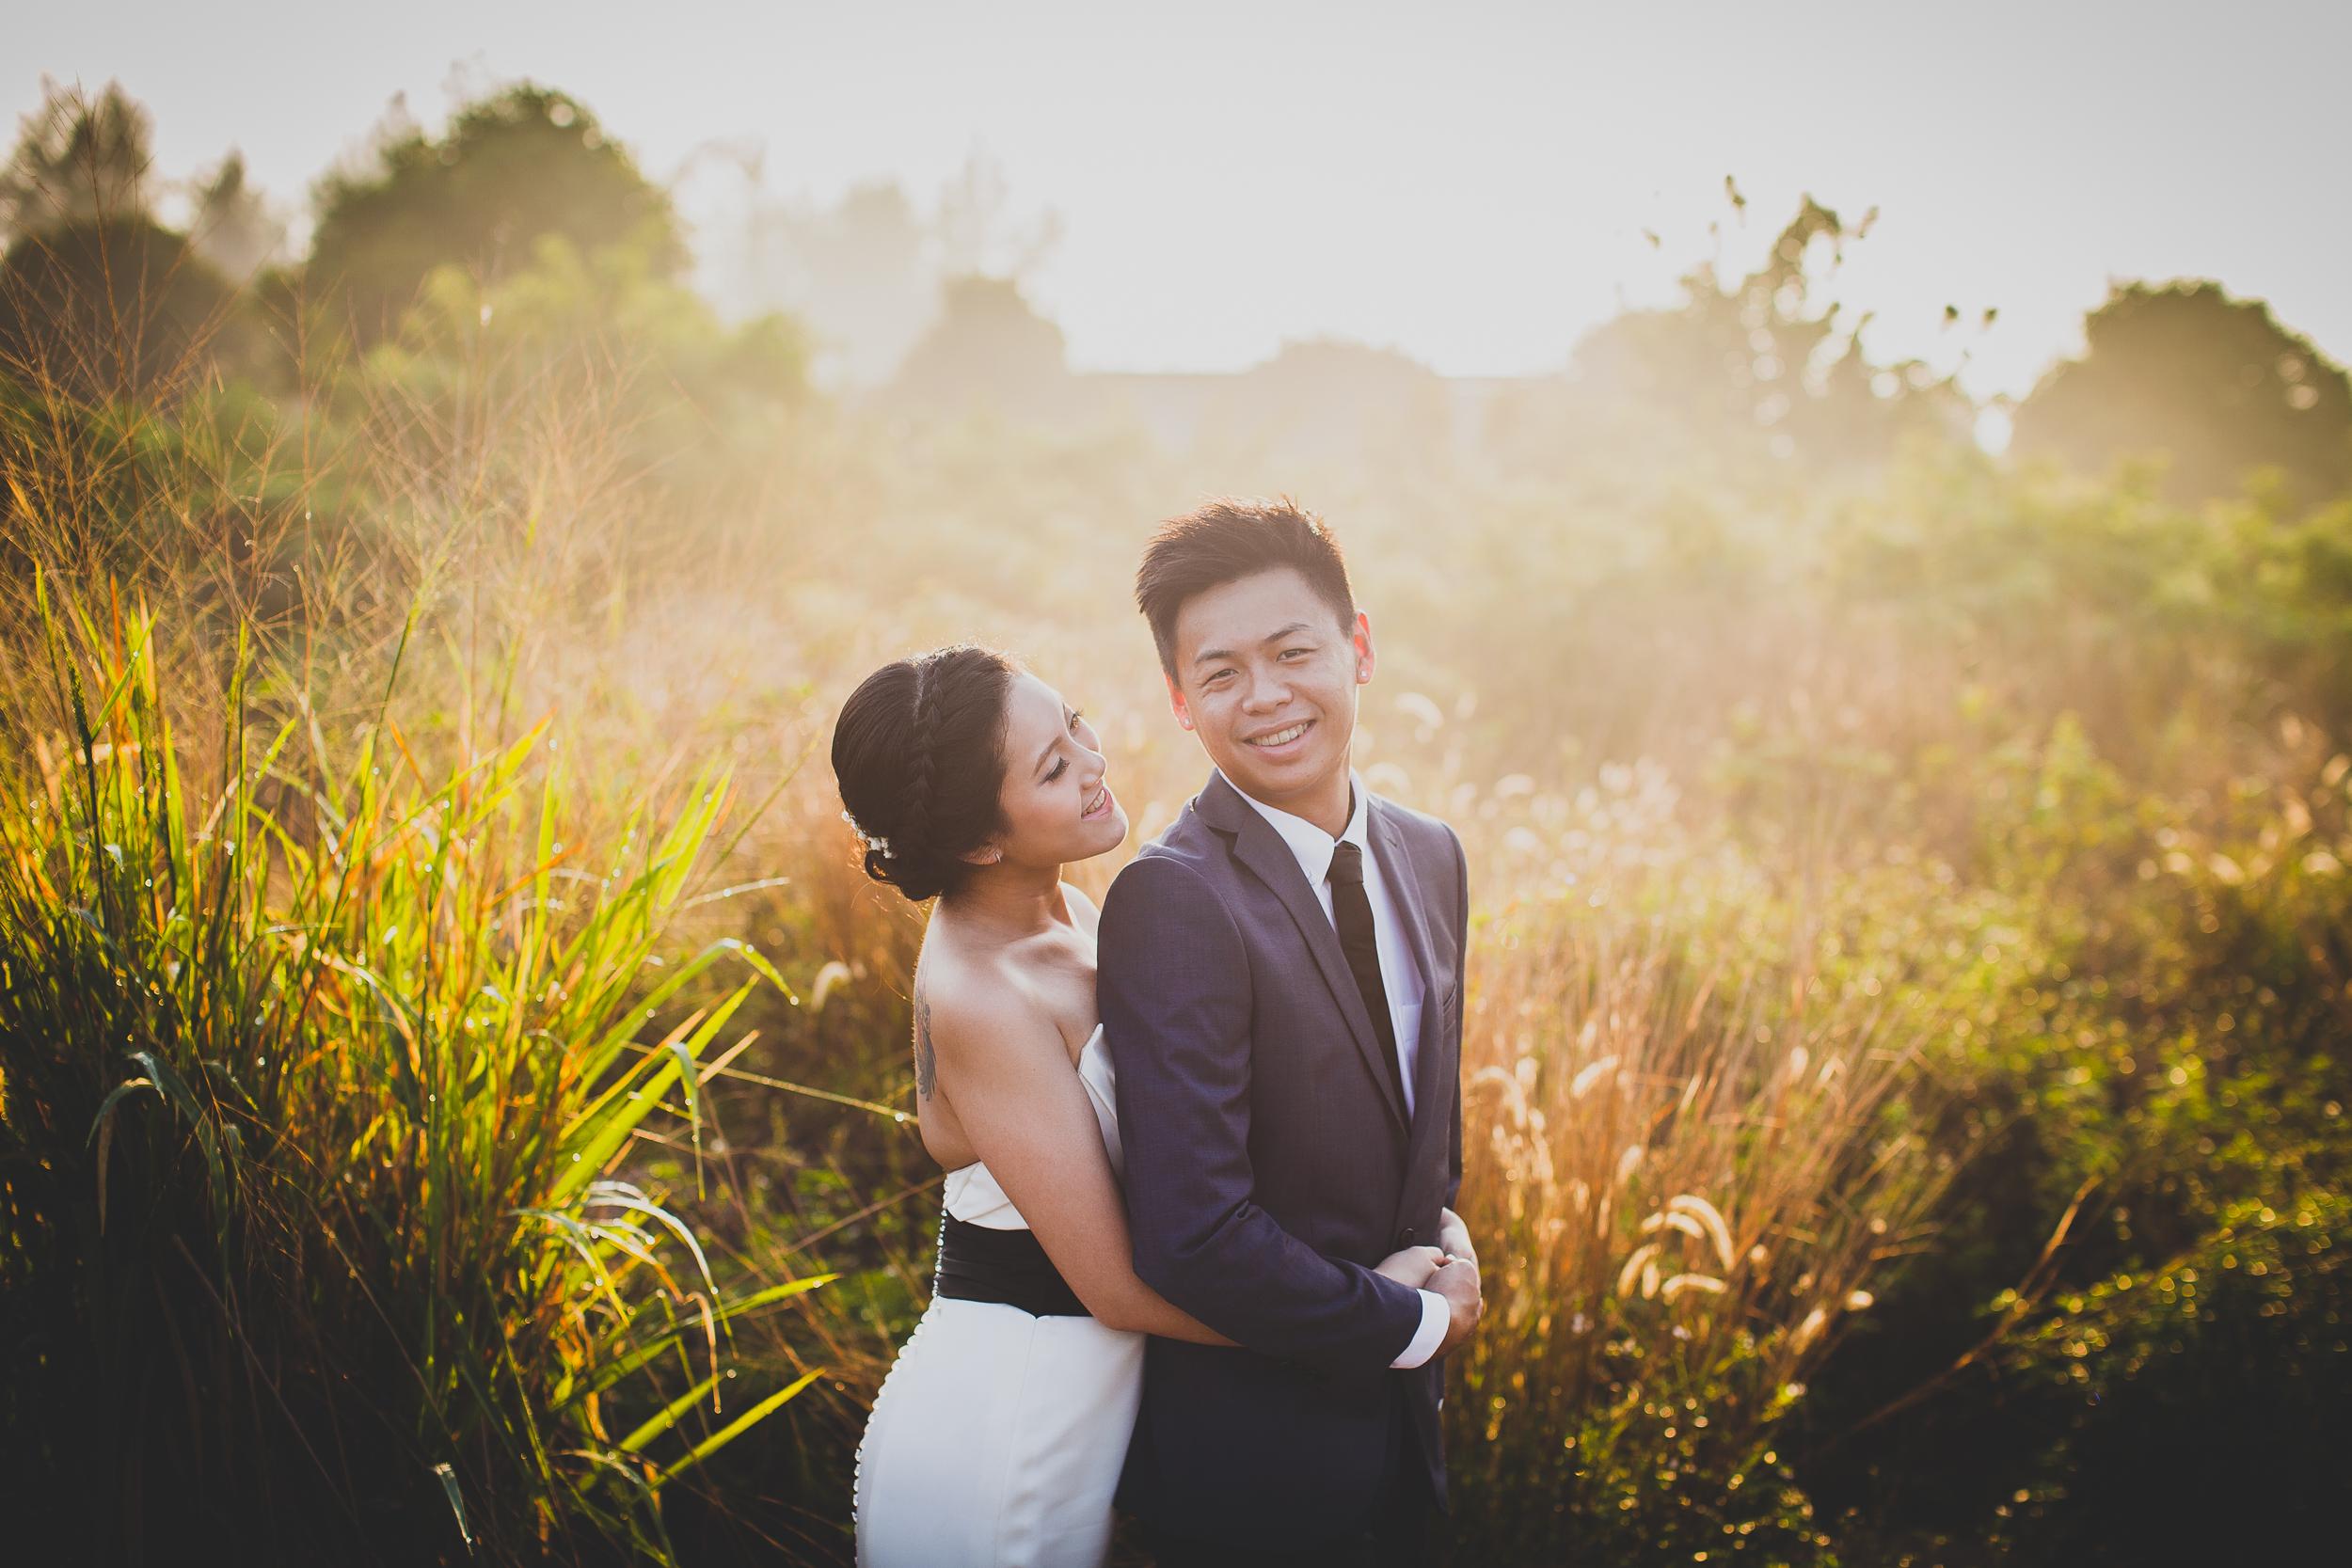 Singapore+Pre+Wedding+Photographer+Ziyang+Clara-0004.jpg